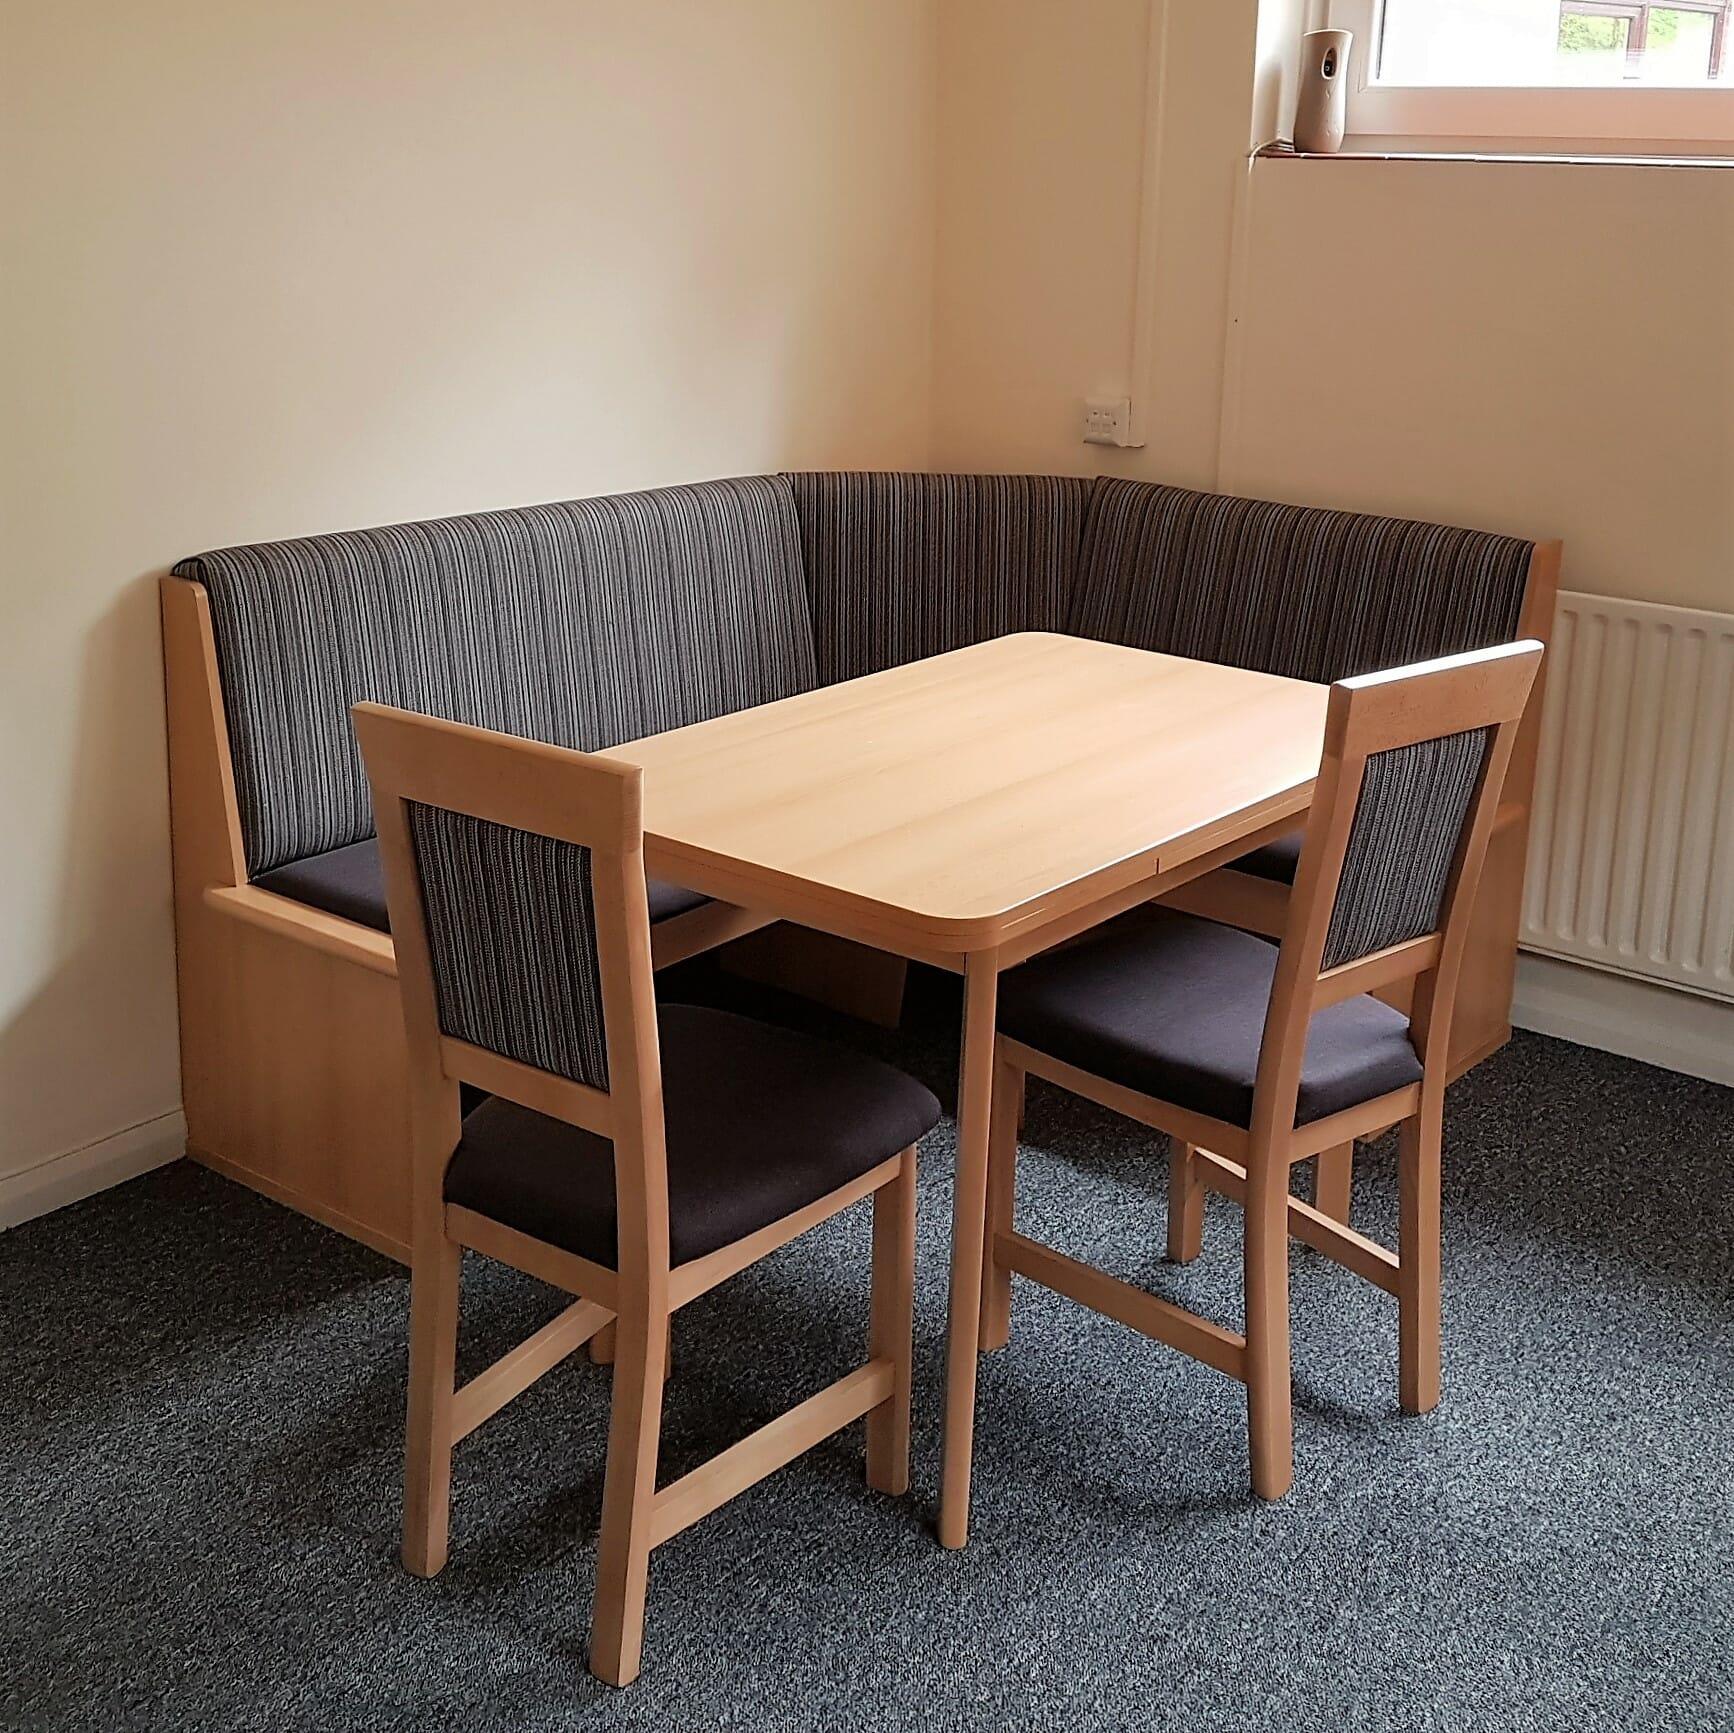 quality chair covers ltd milton keynes hanging urban robert d imola set lawton imports